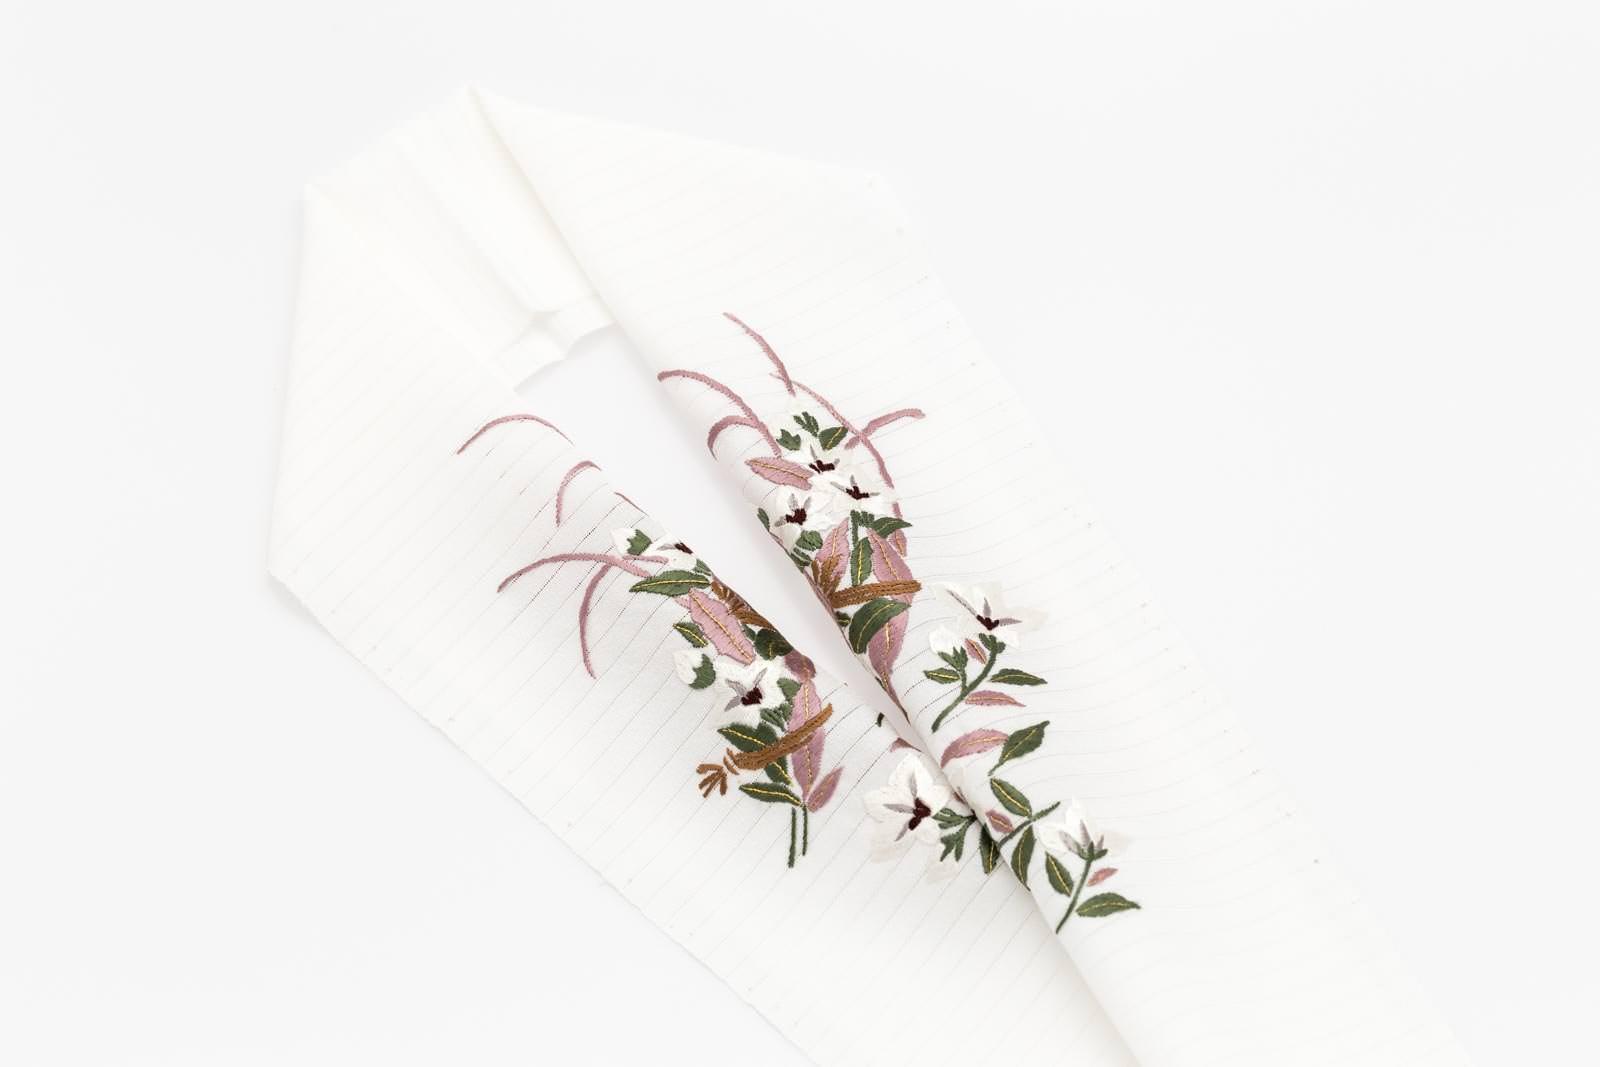 手刺繍 半襟 パールトーン加工済  シルク100% 絽 塩瀬 手刺繍 半衿   夏用 白 桔梗